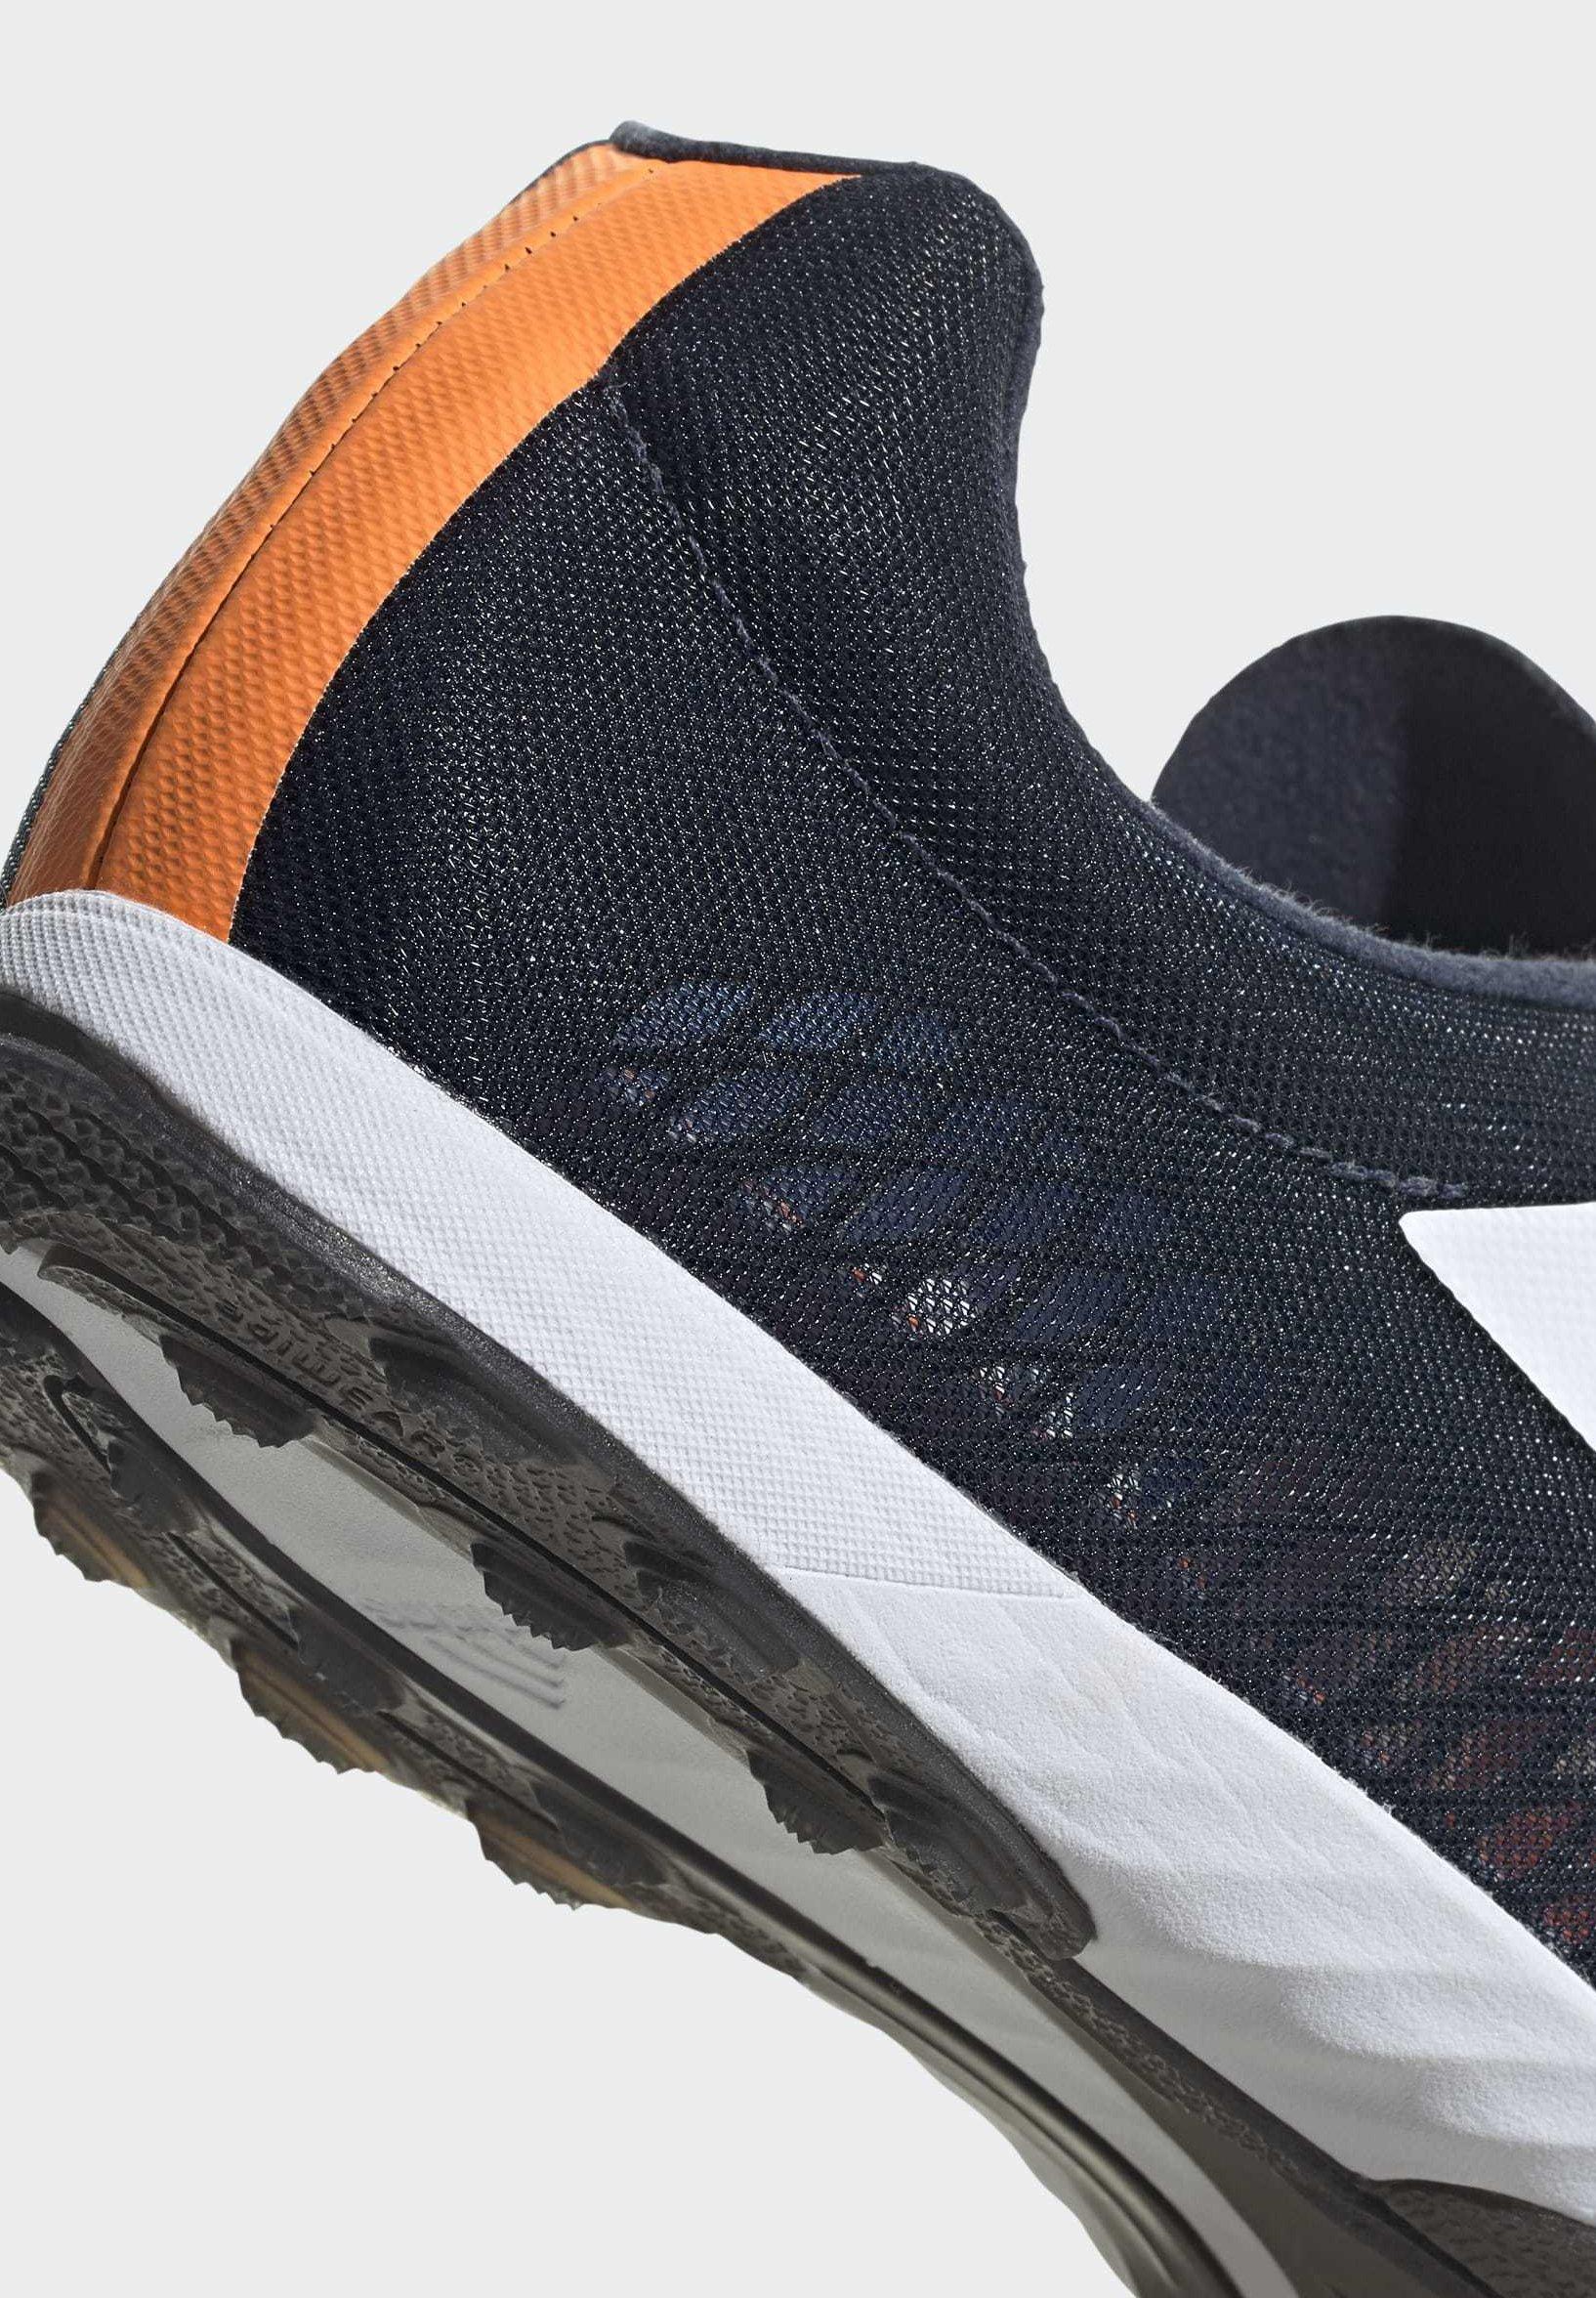 Adidas Performance Adizero Xc Sprint Shoes - Neutrale Løbesko Blue